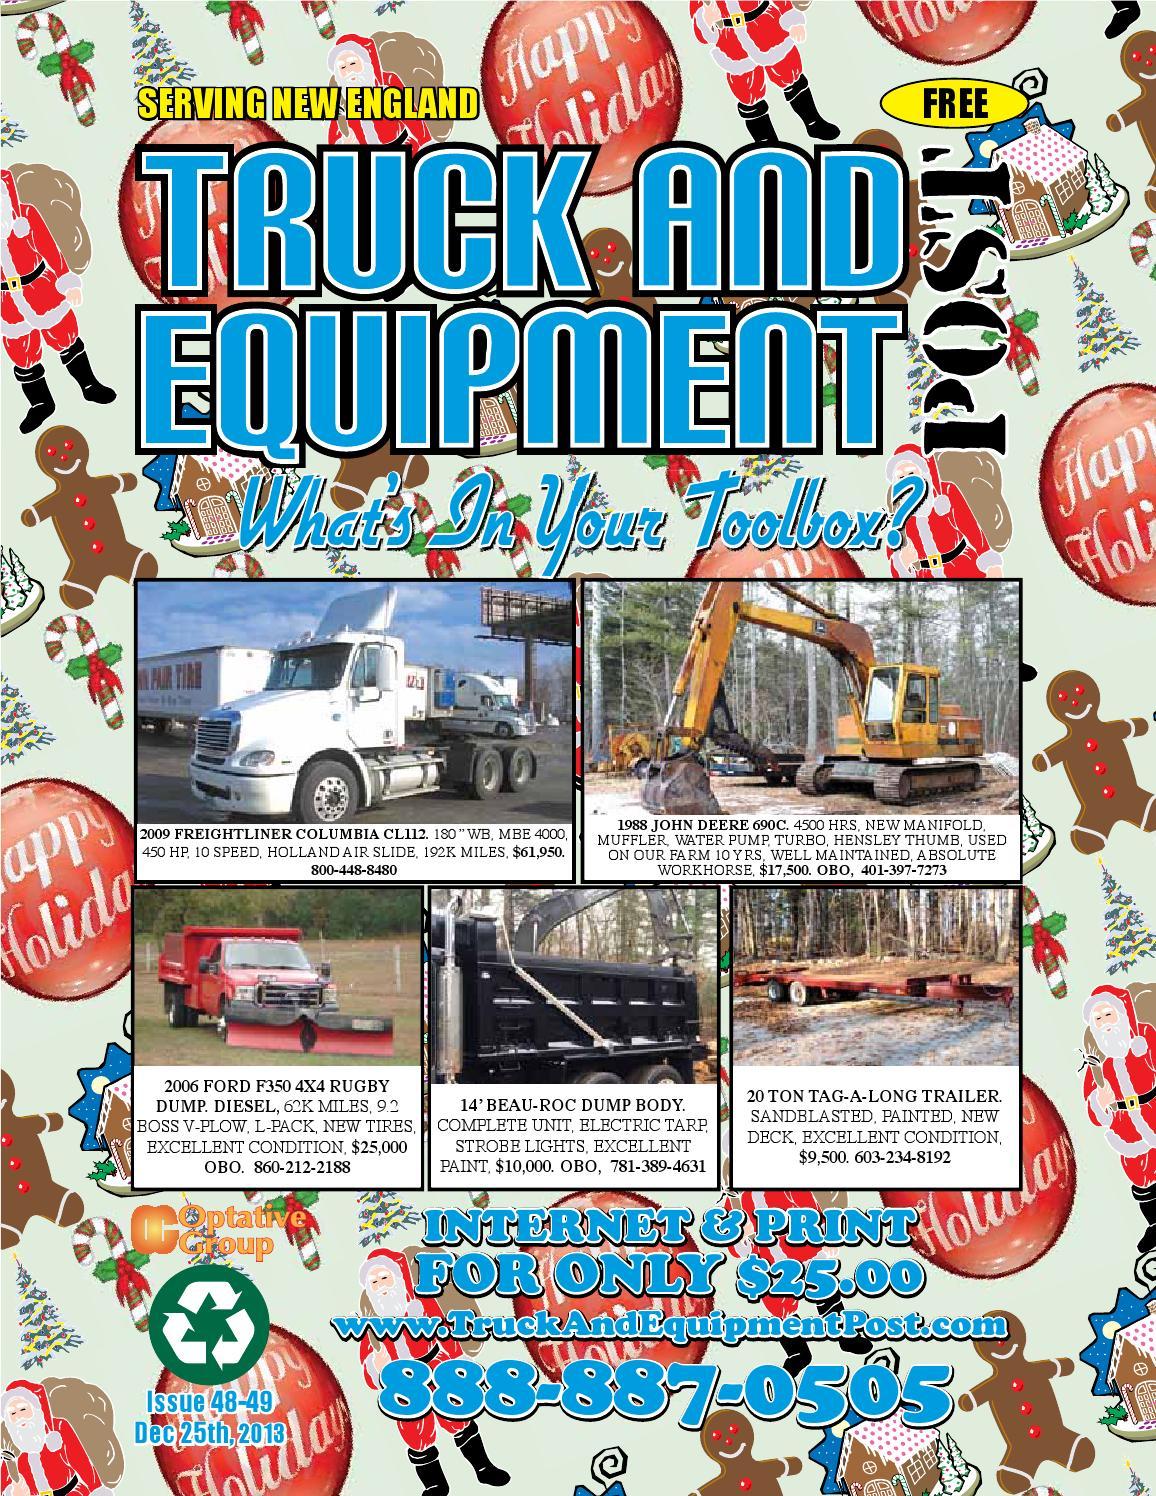 Truck Equipment Post 50 51 2013 By 1clickaway Issuu Pacar W900 Fuse Diagram 2001